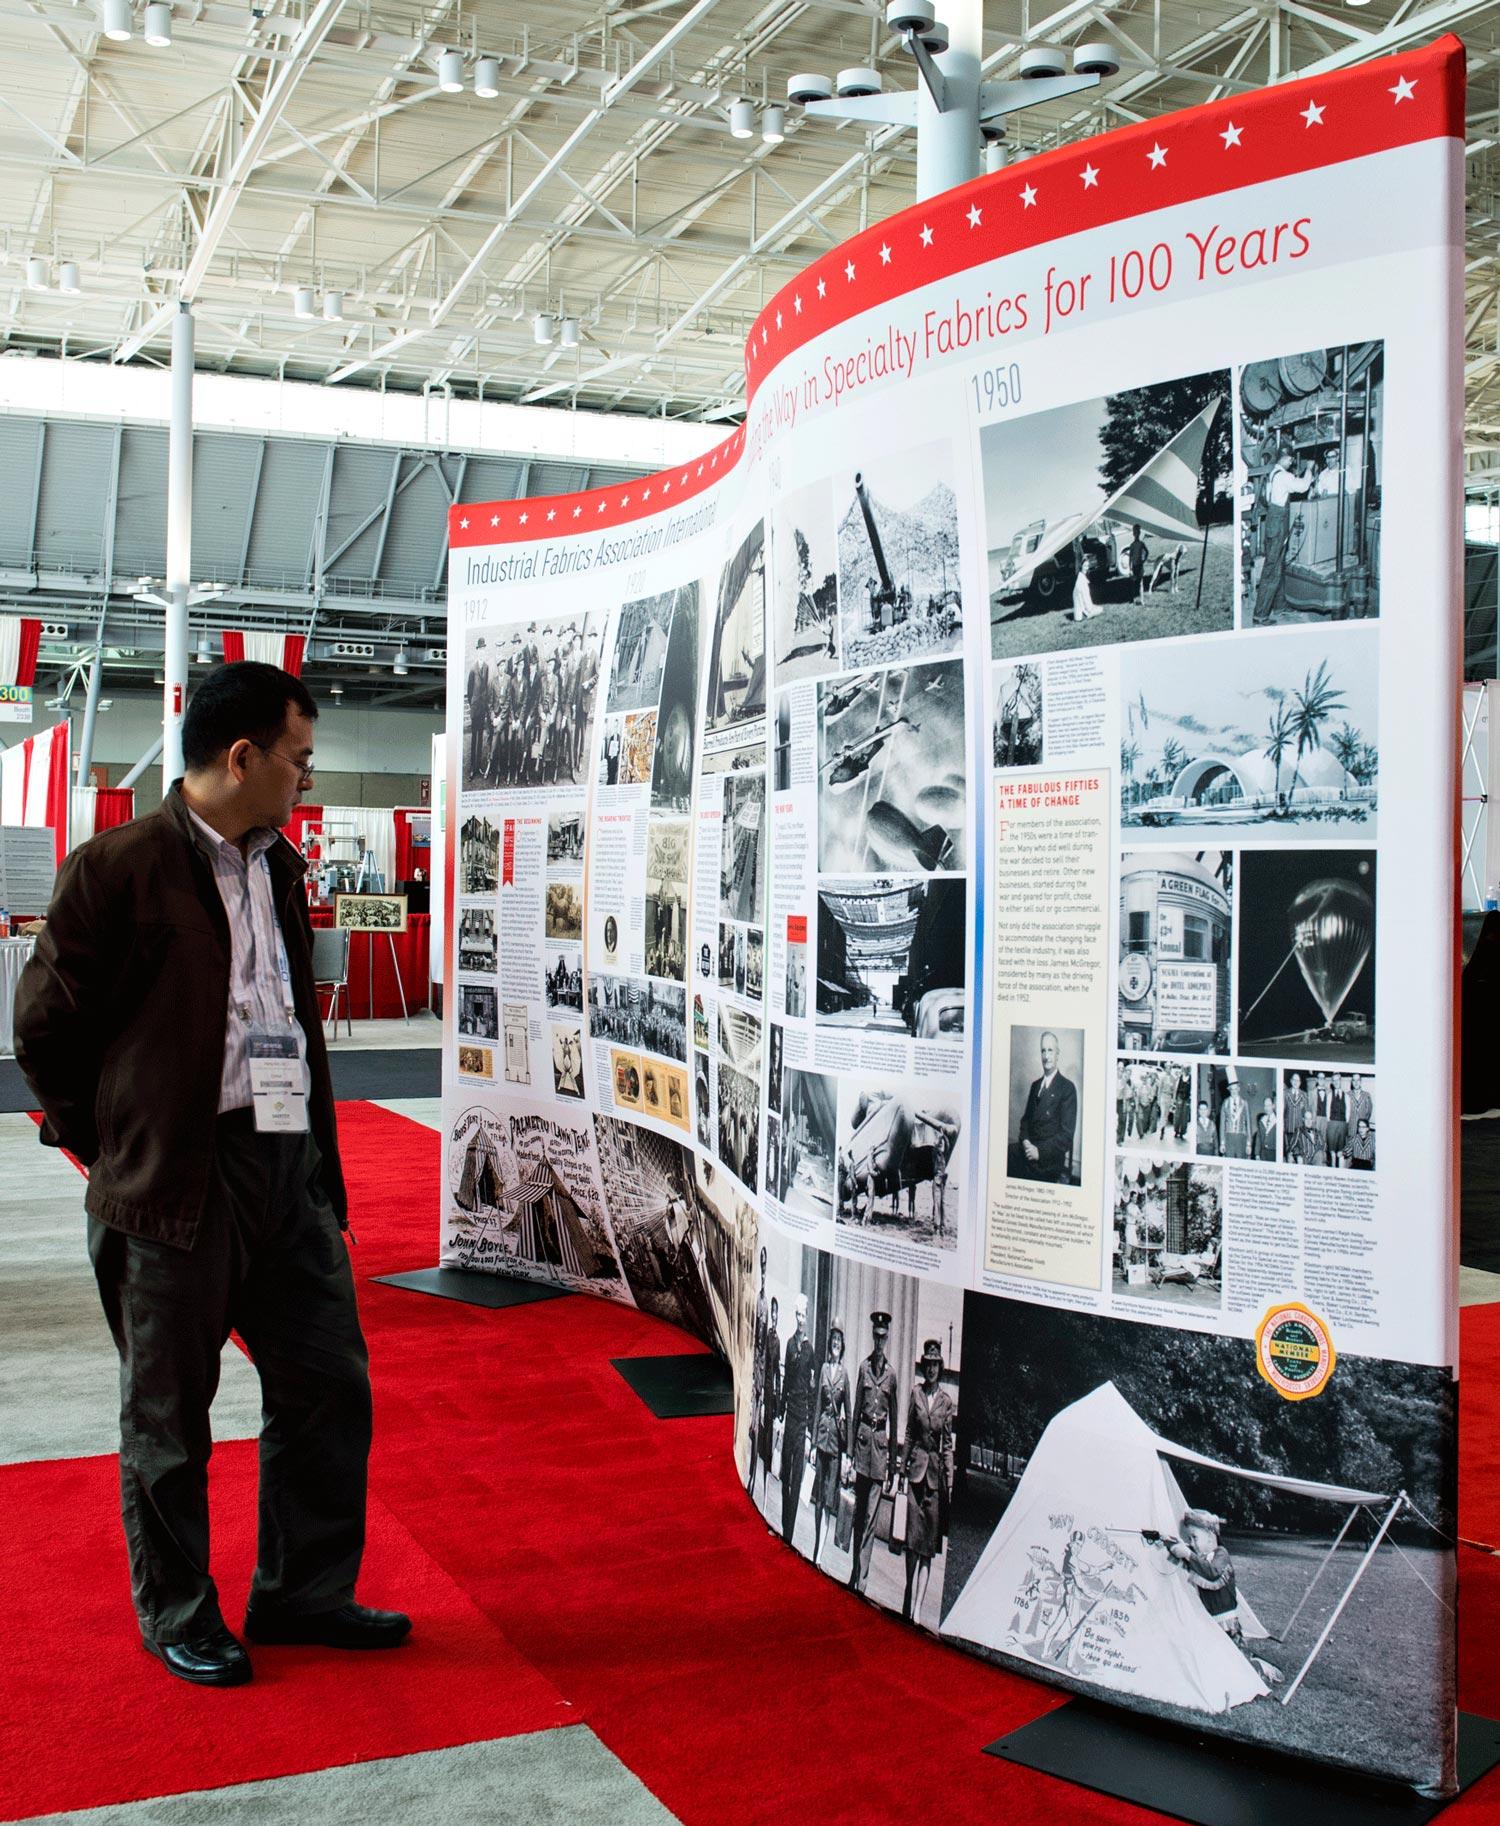 8_IFAI_HistoryMuseum_A.jpg